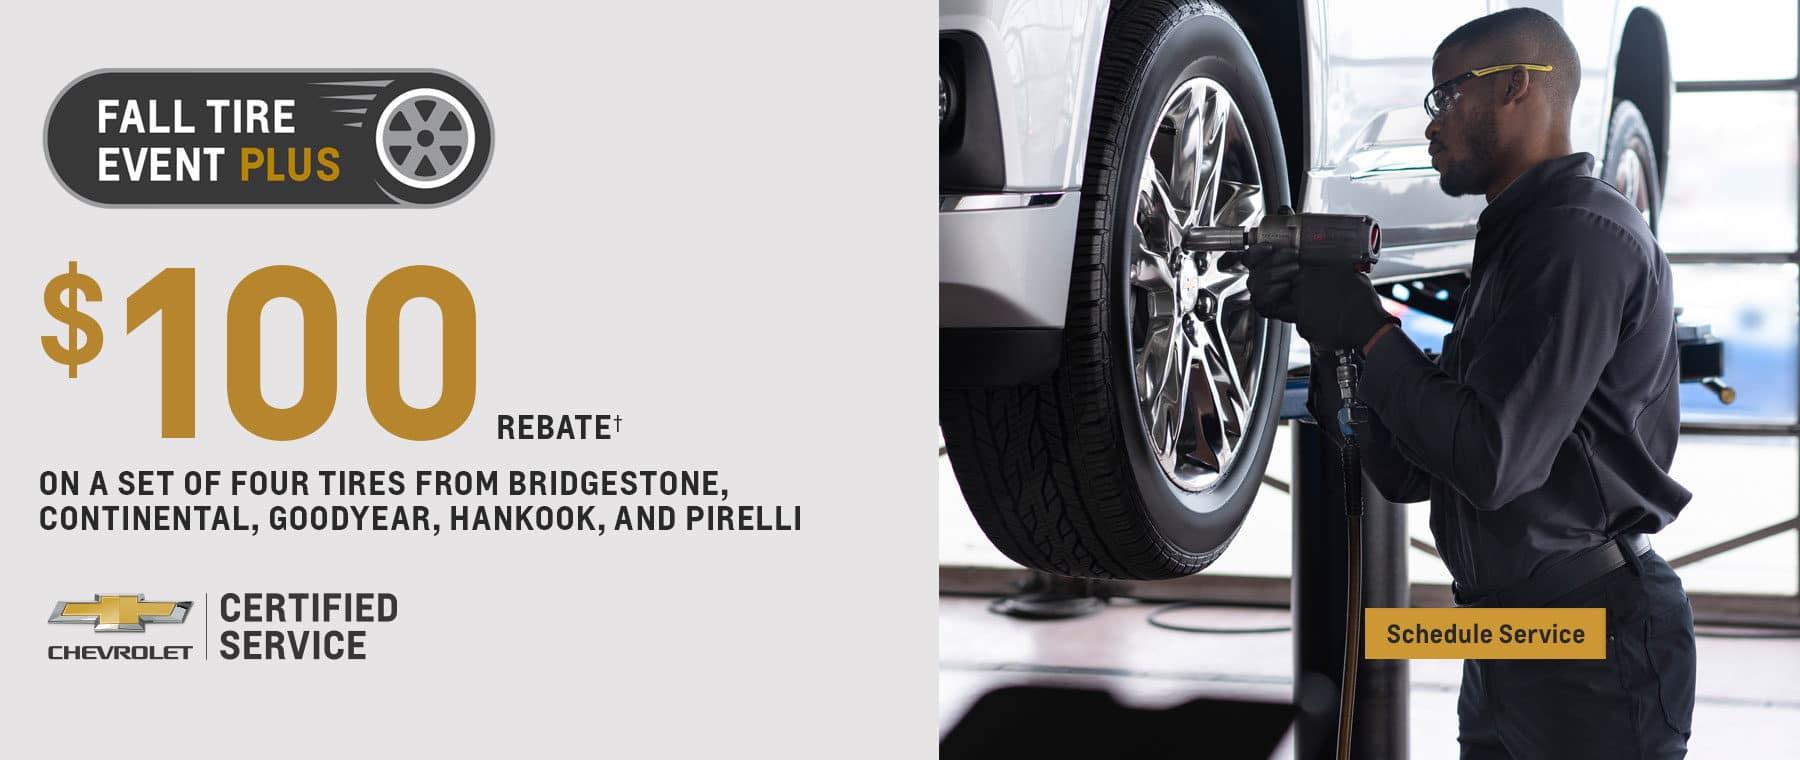 Fall Tire Event Plus – Desktop